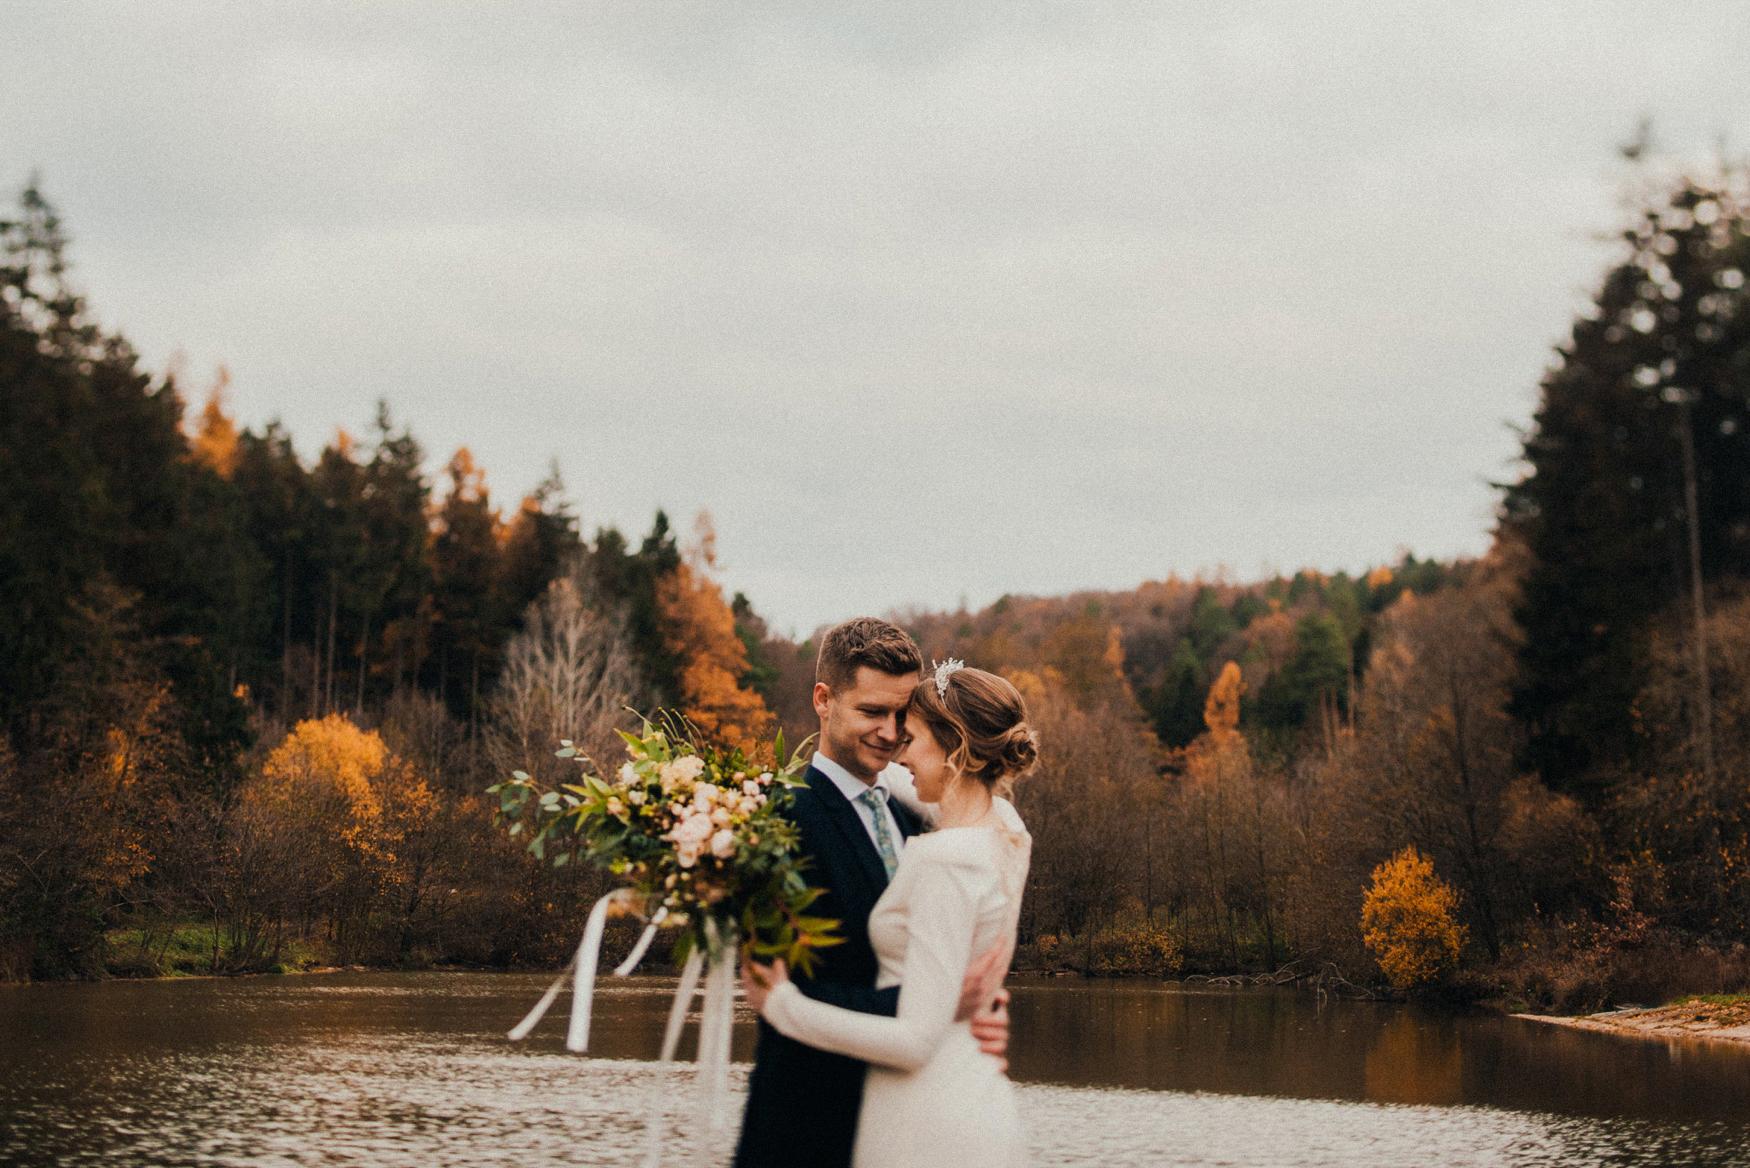 3 czech countryside rustic wedding - svatba zikmundov010.jpg